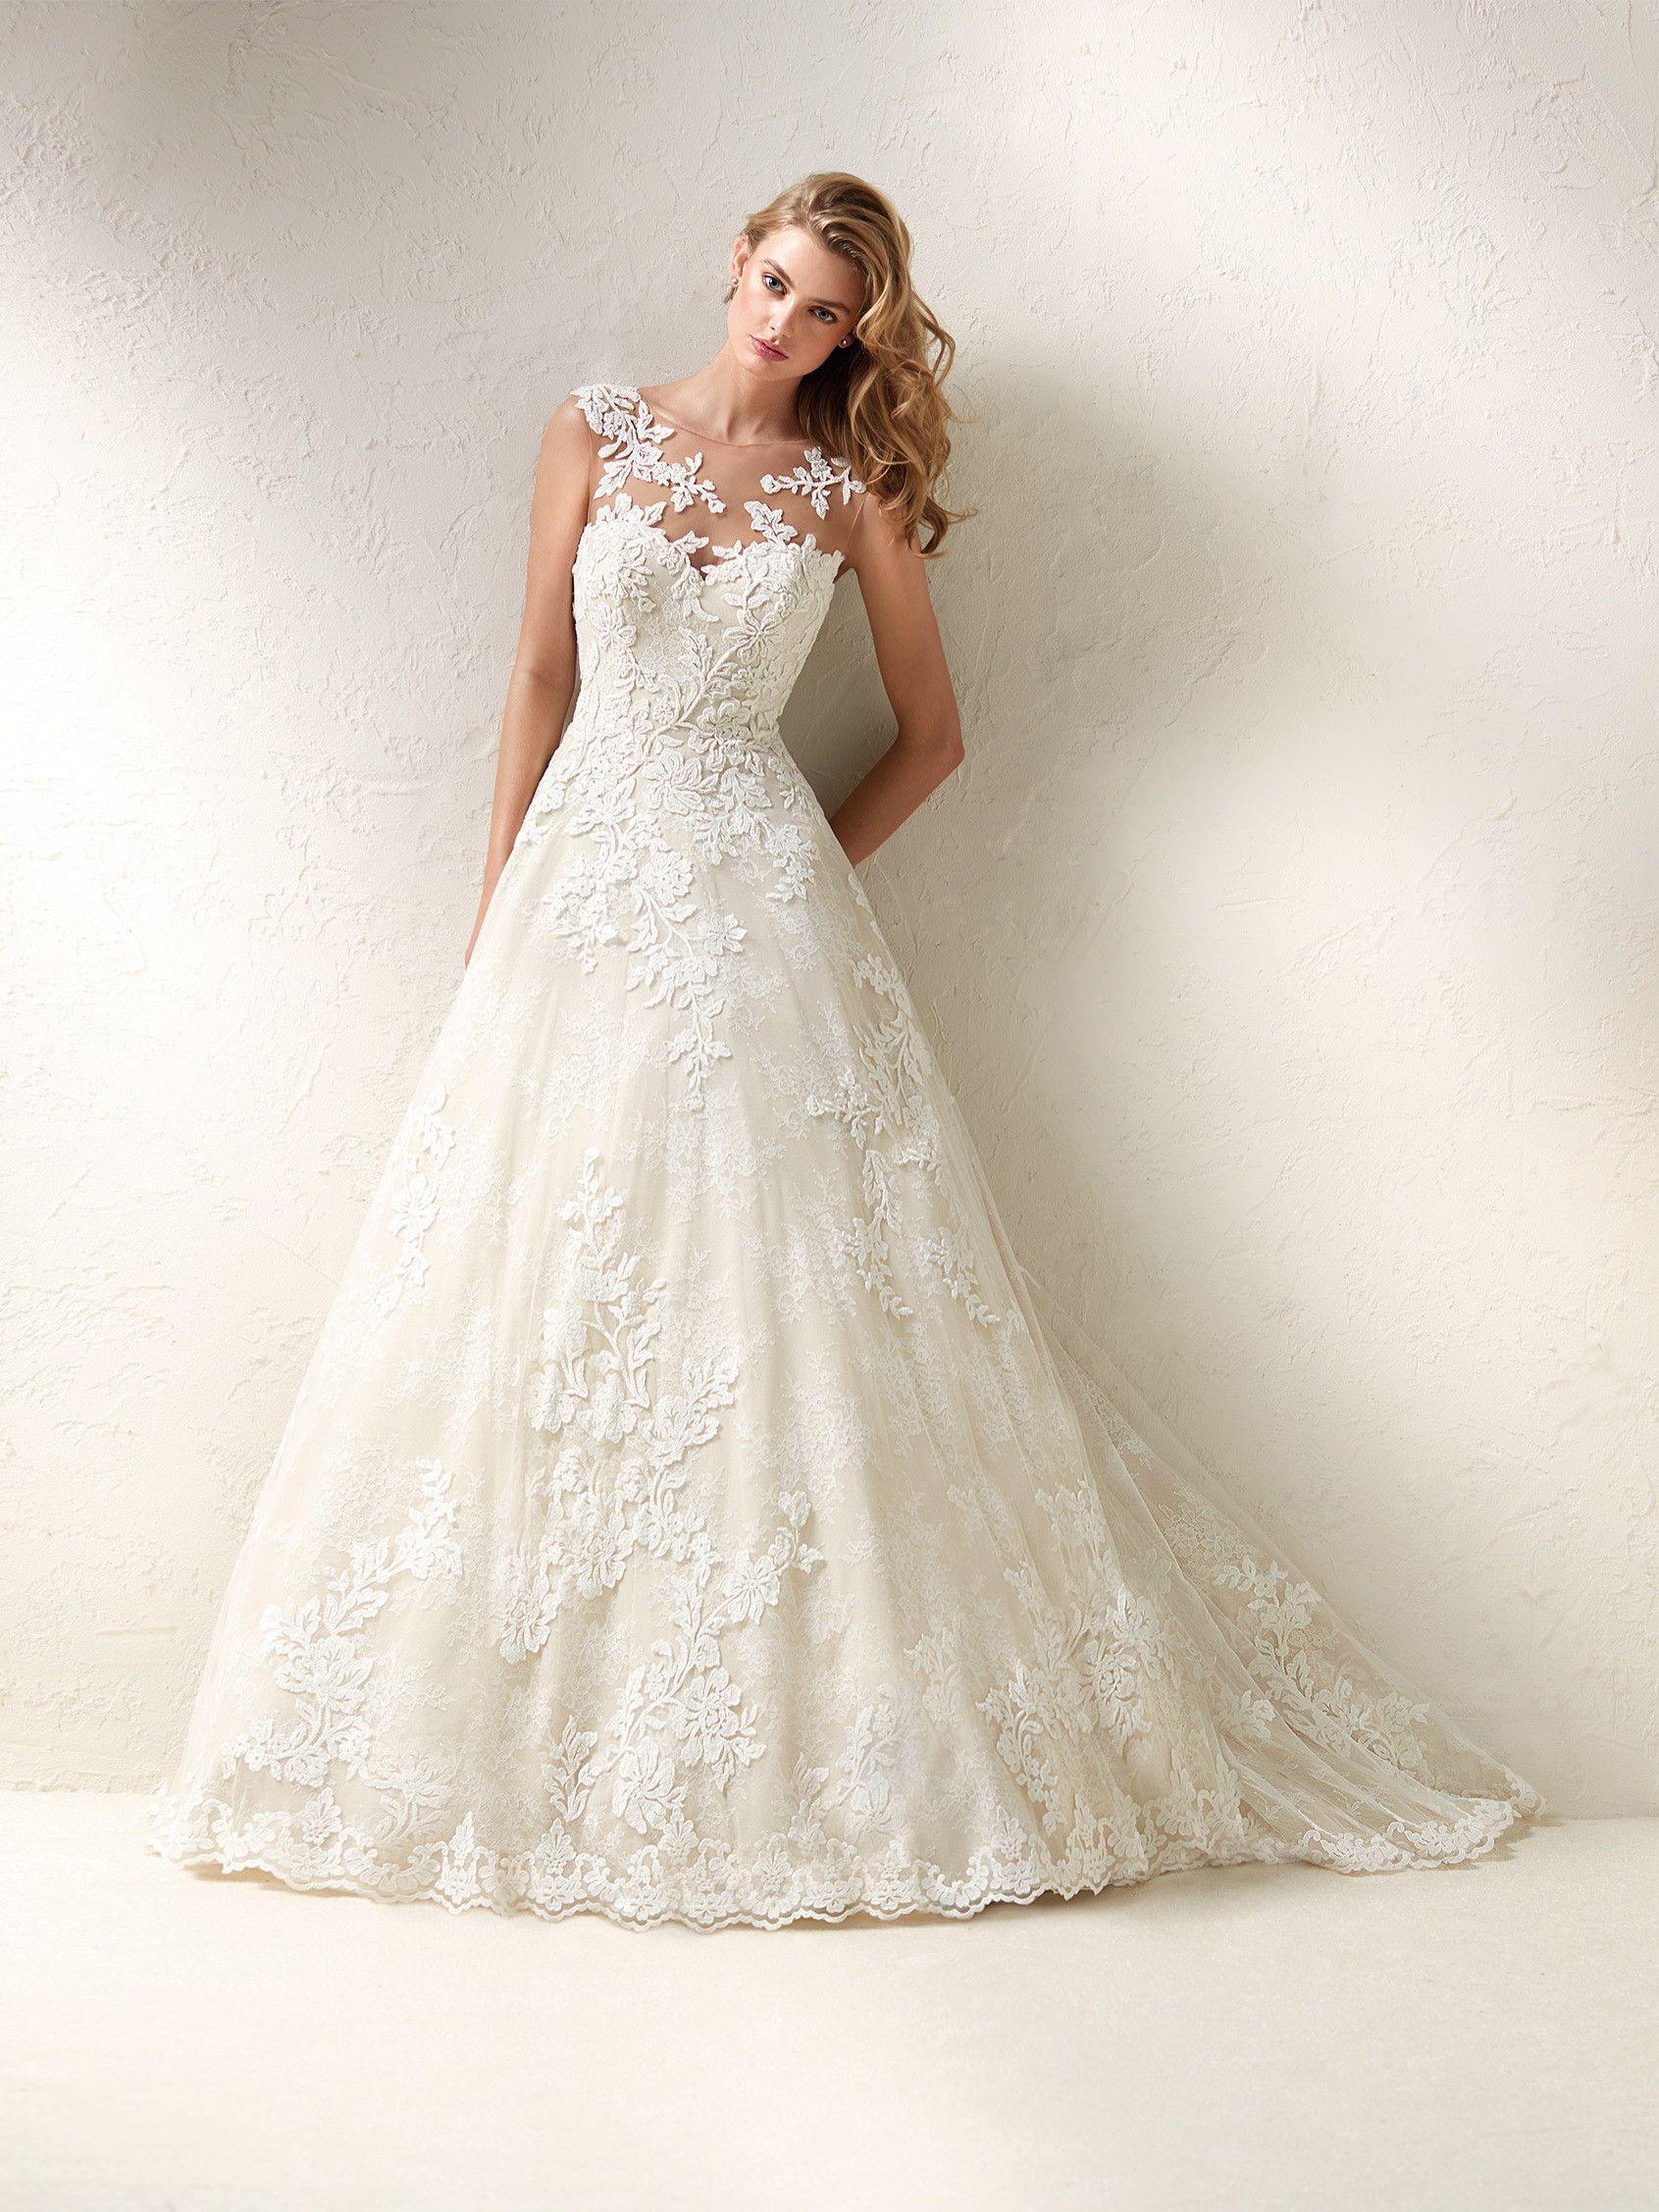 Dracme: Princess design wedding dress with full flared skirt, illusion bodice and back and gemstone details - Pronovias